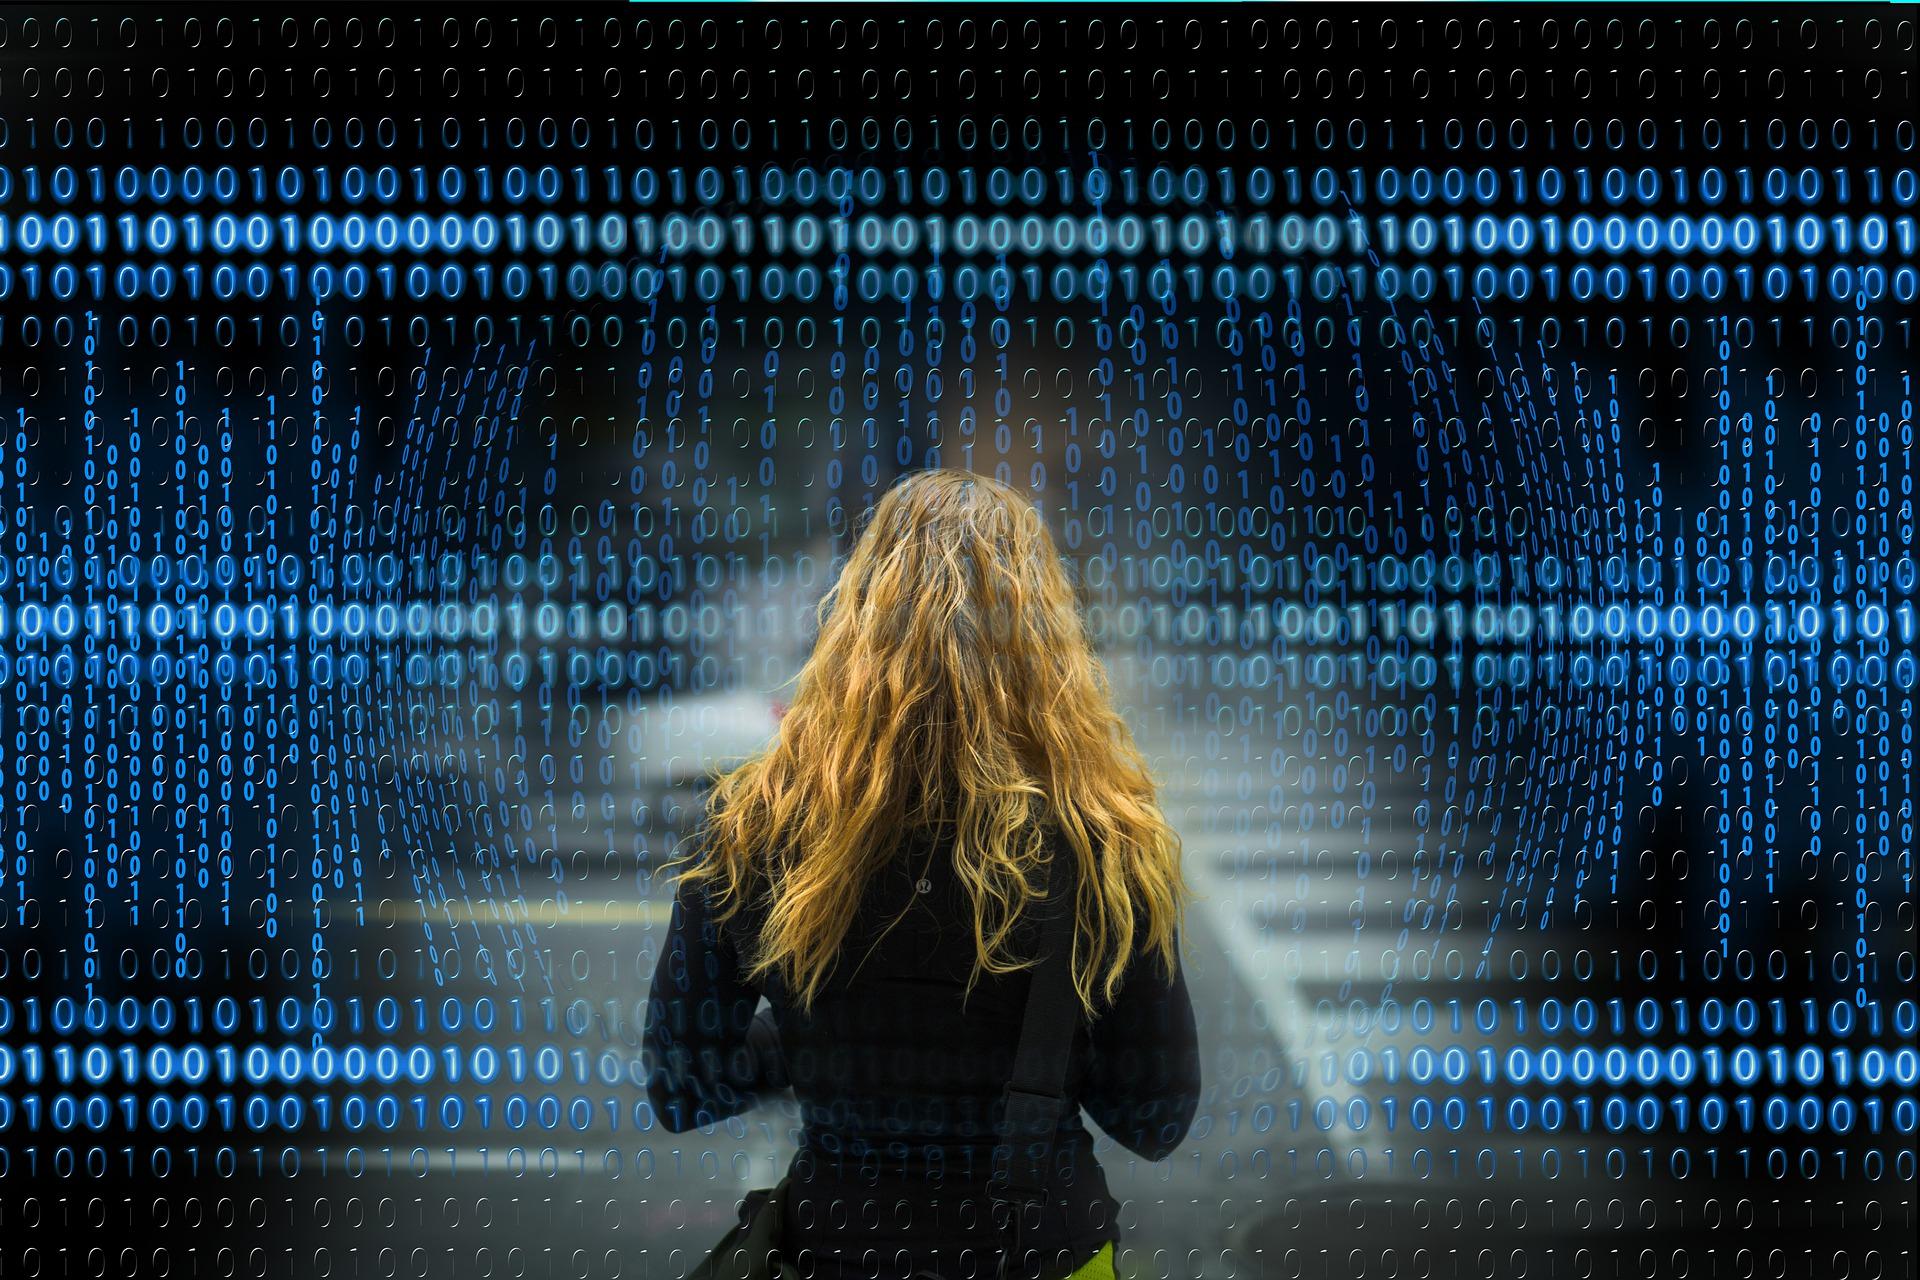 Anaxco Blog Beitrag Bild Datenbank IT-Services Zukunft IT-Lösungen Digitalisierung Cybersecurity